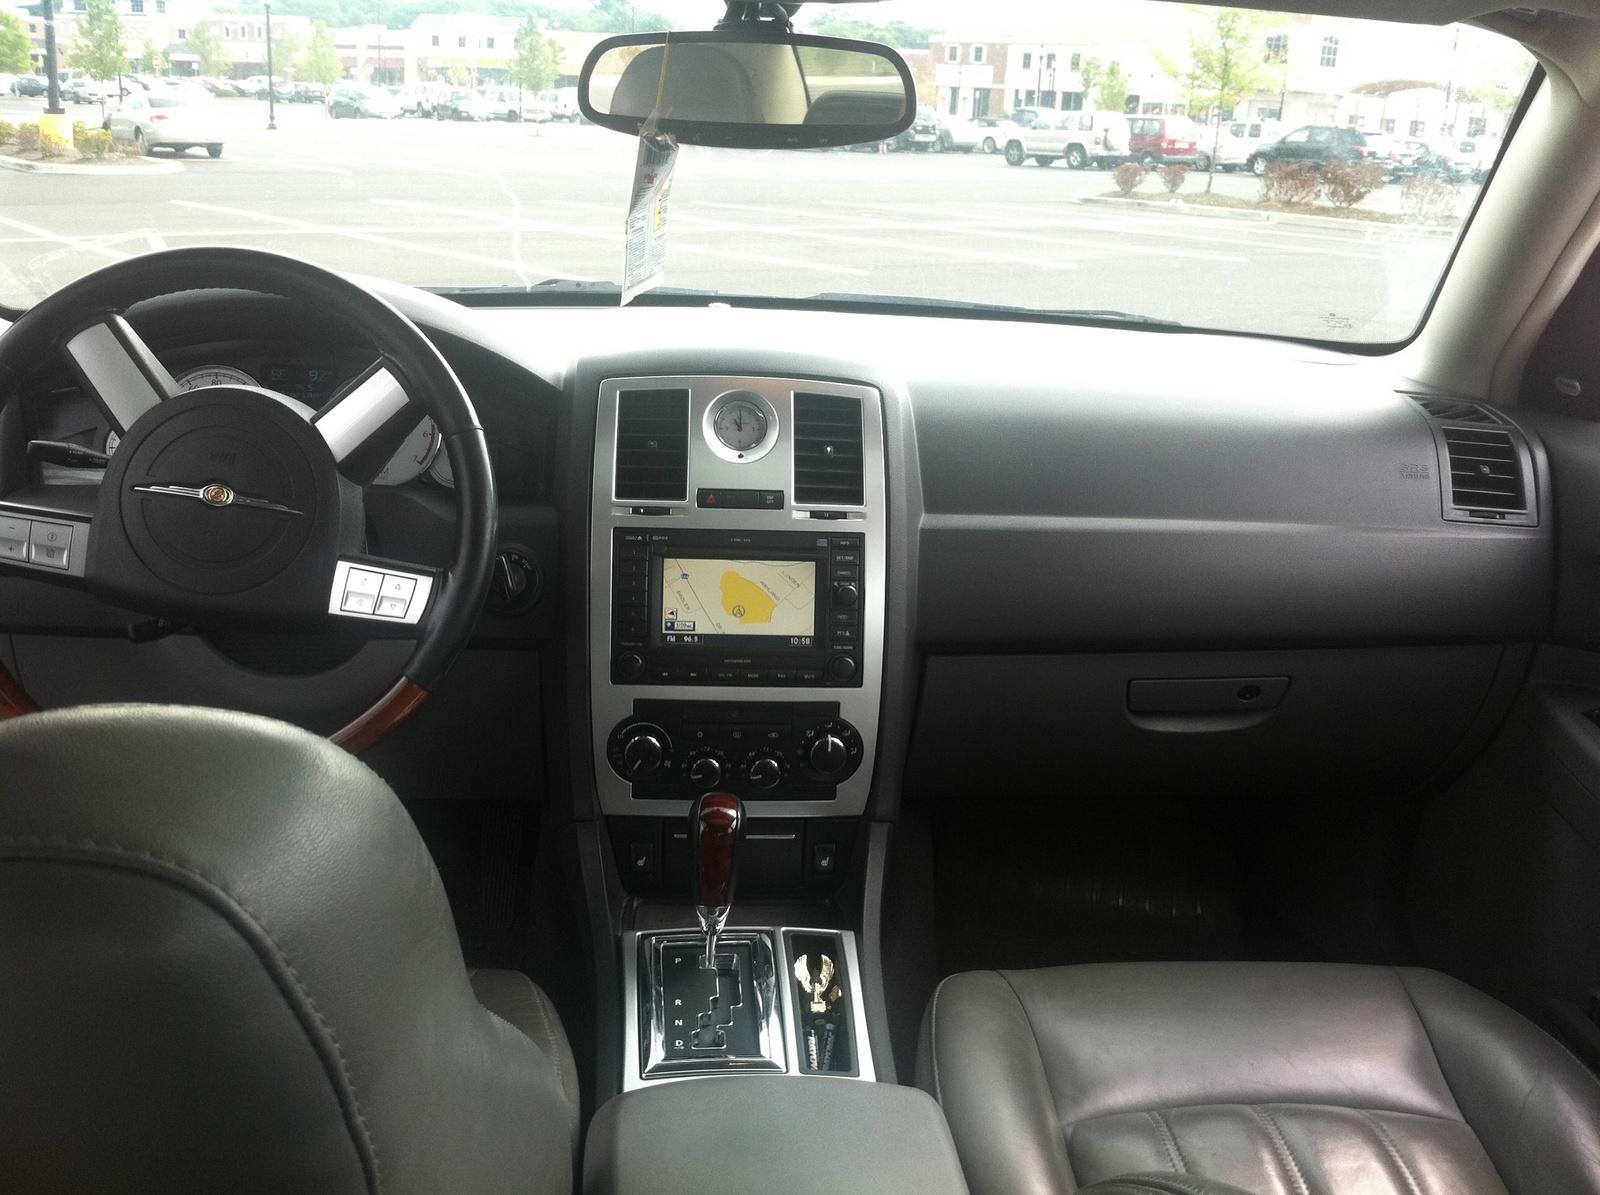 Dodge Dealers Near Me >> 2005 Chrysler 300 - Interior Pictures - CarGurus